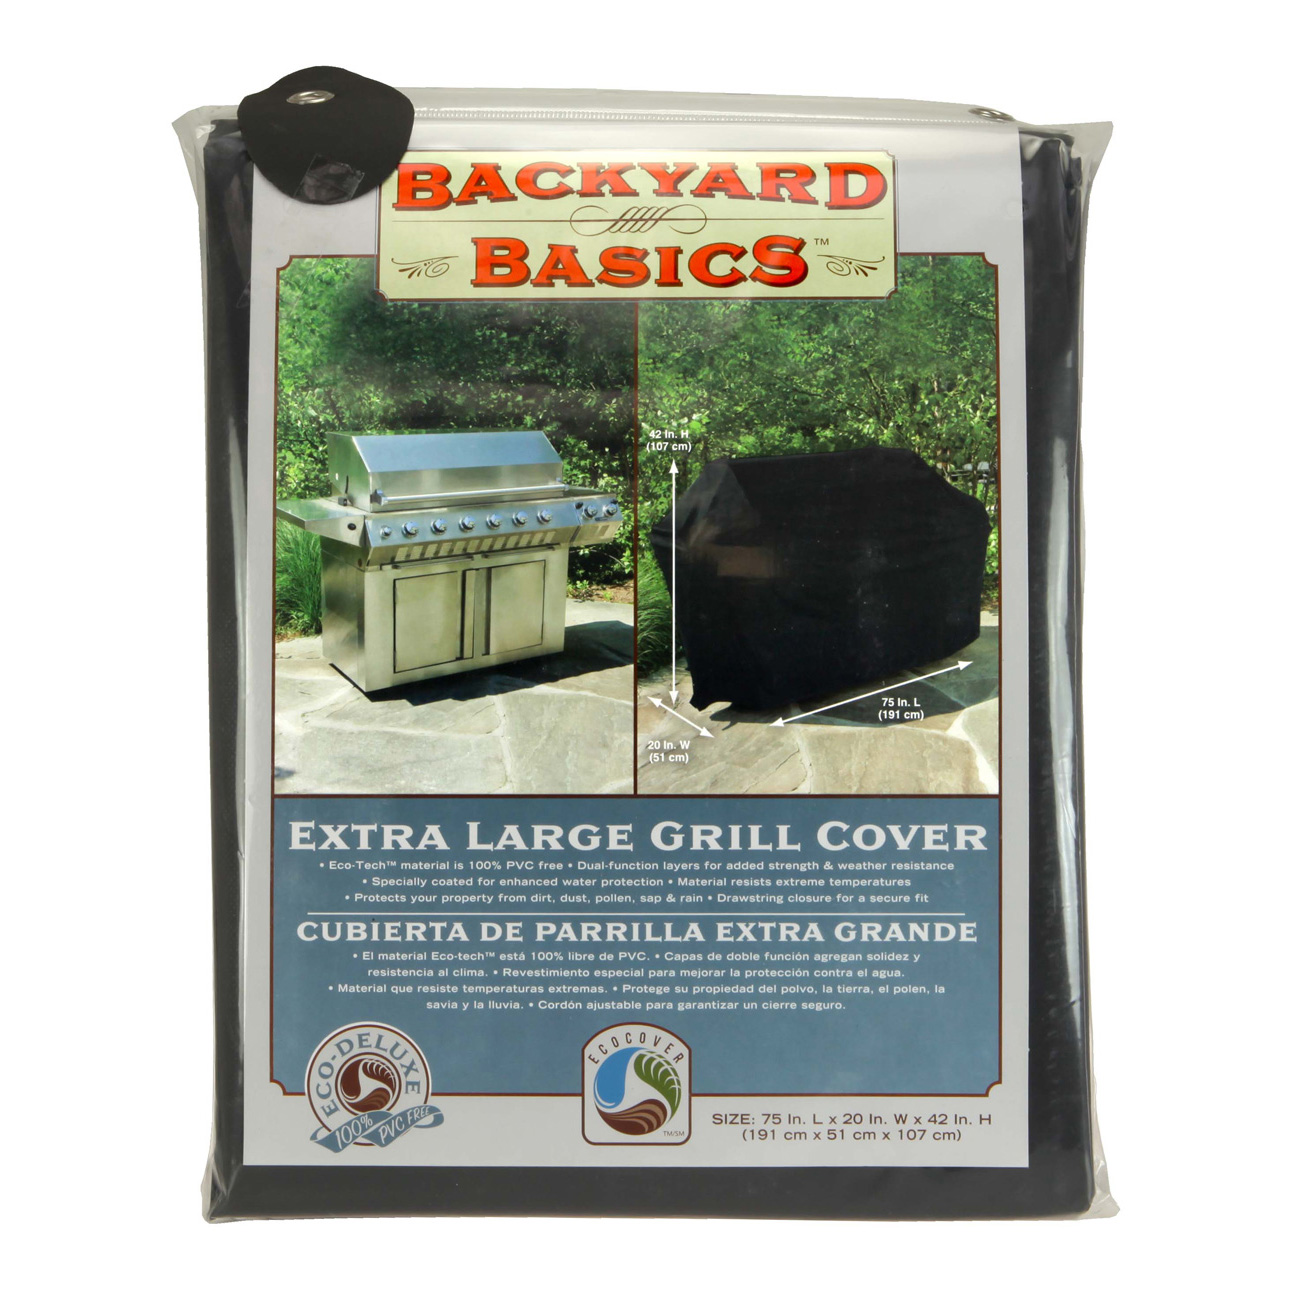 Backyard Basics Grill Cover XL